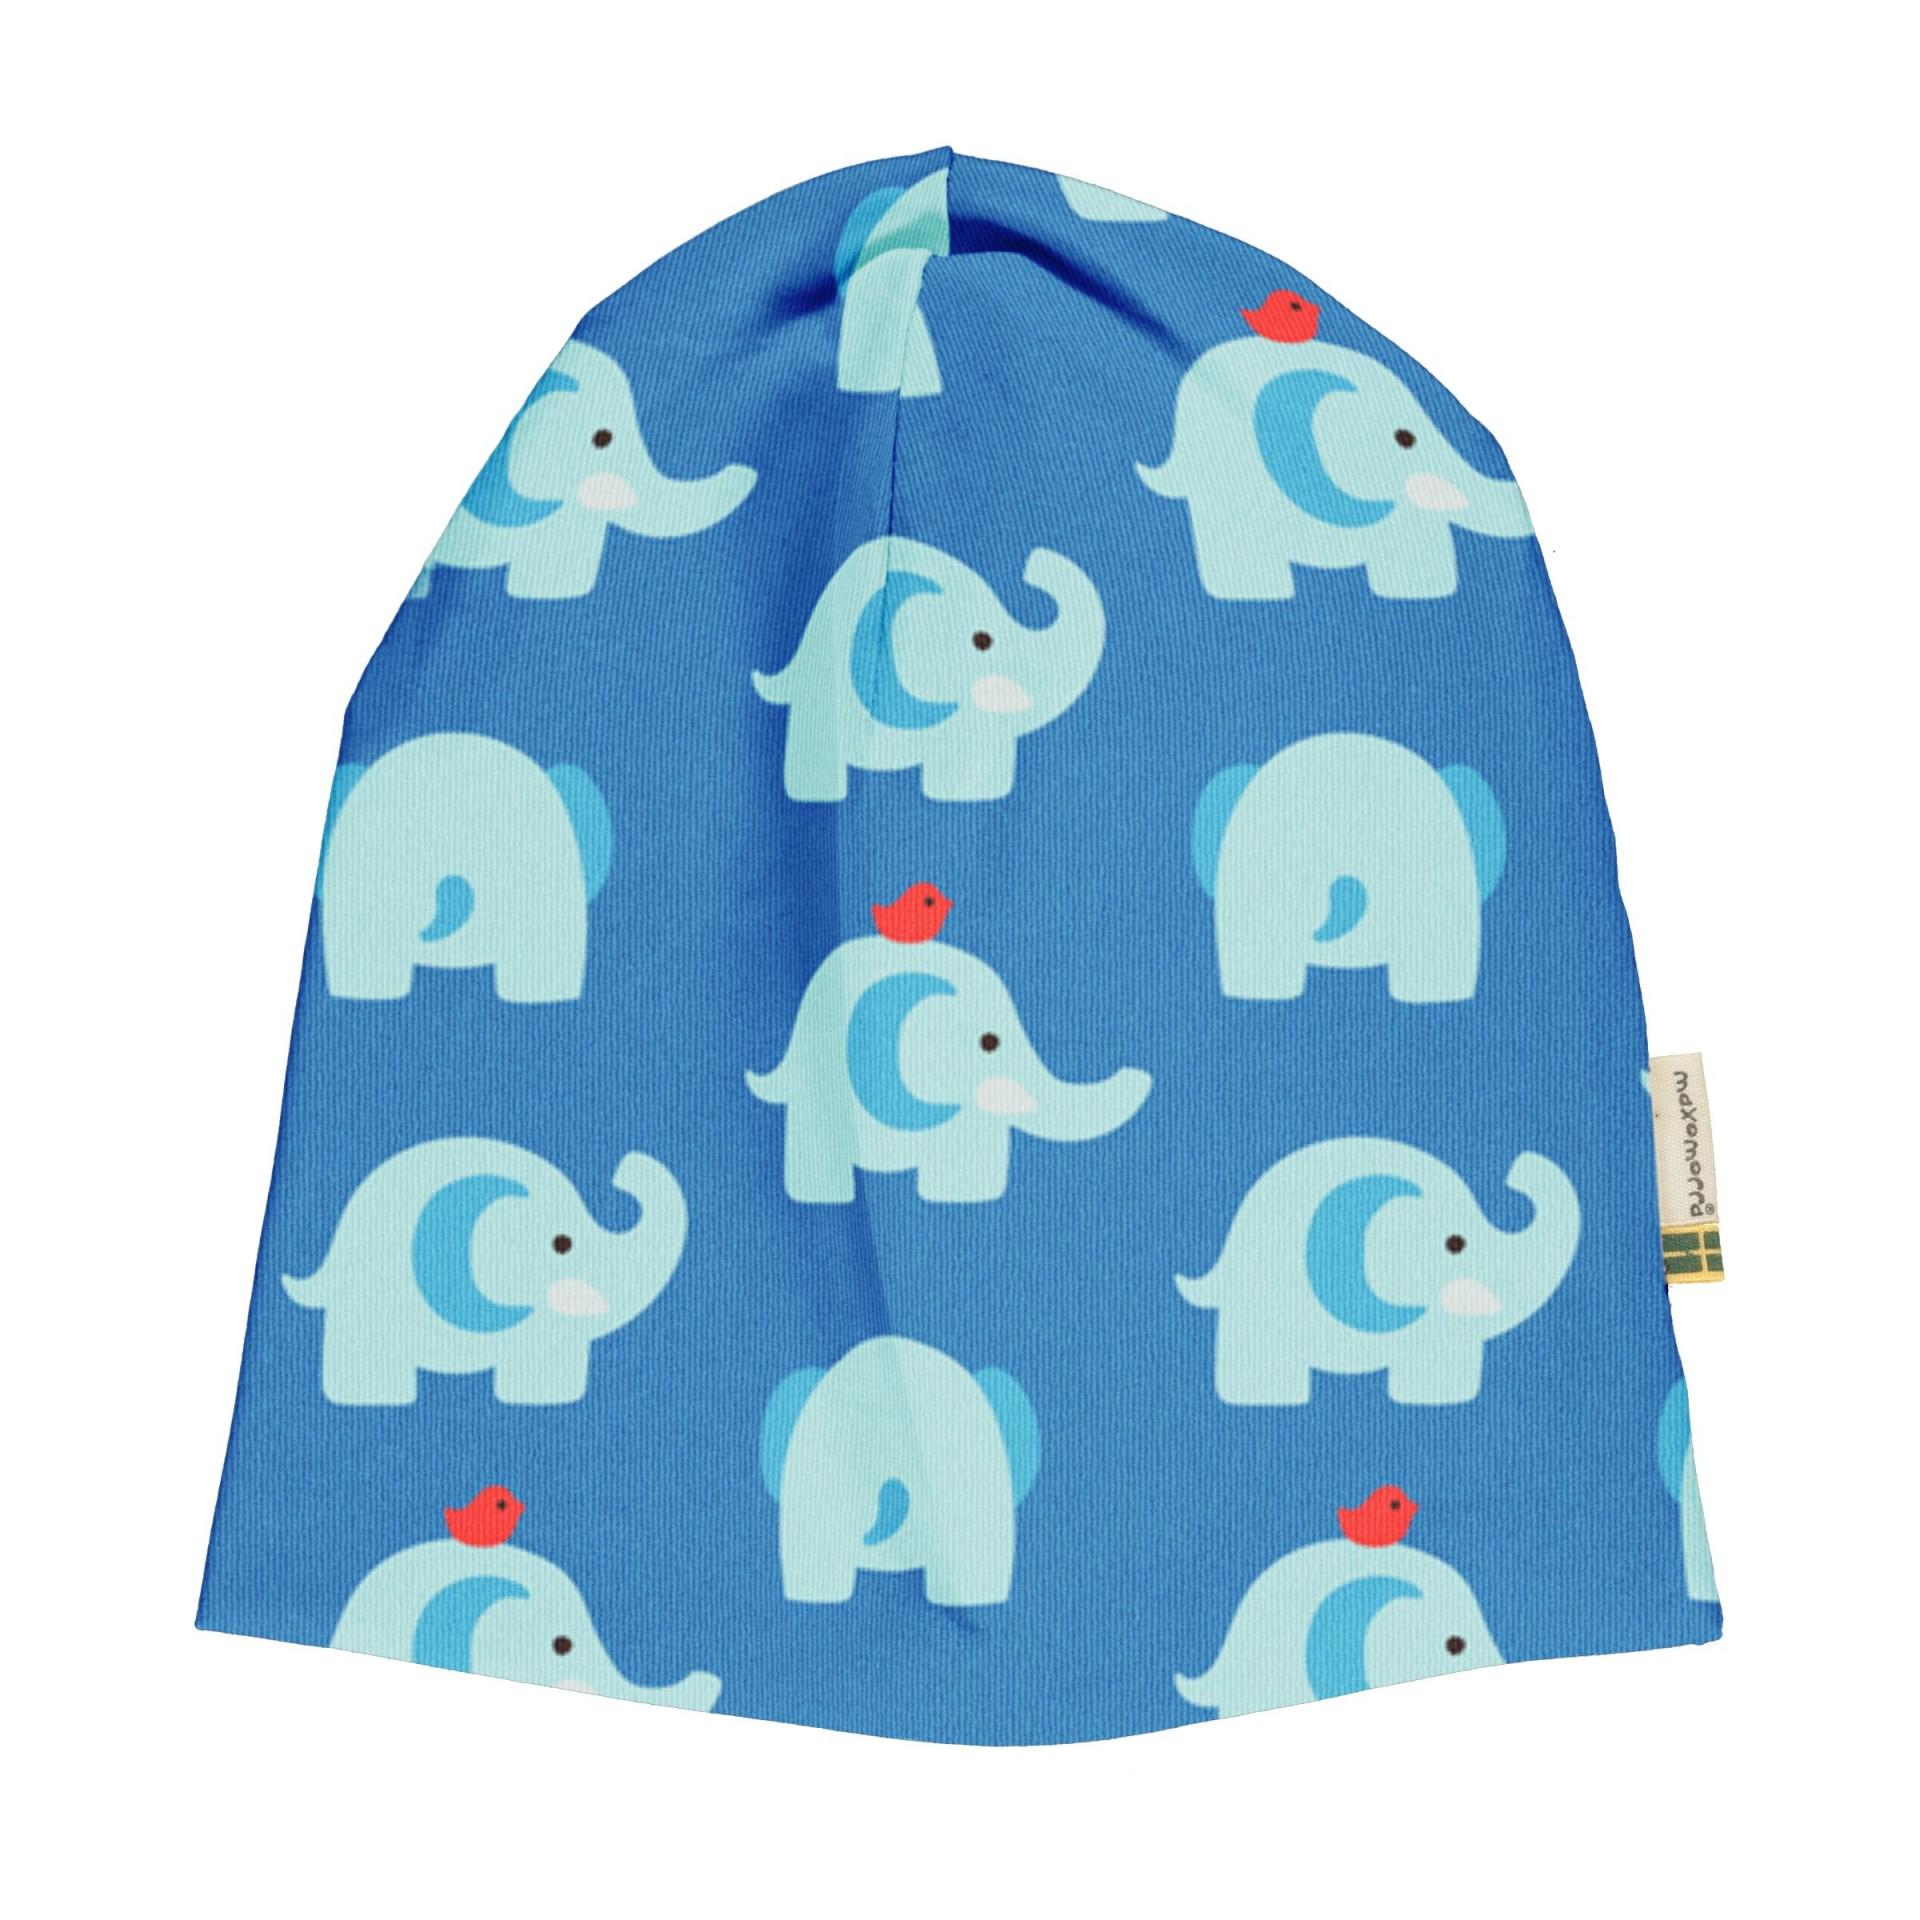 Gorro Elephant Friends Maxomorra (Tamanhos disponíveis 44)